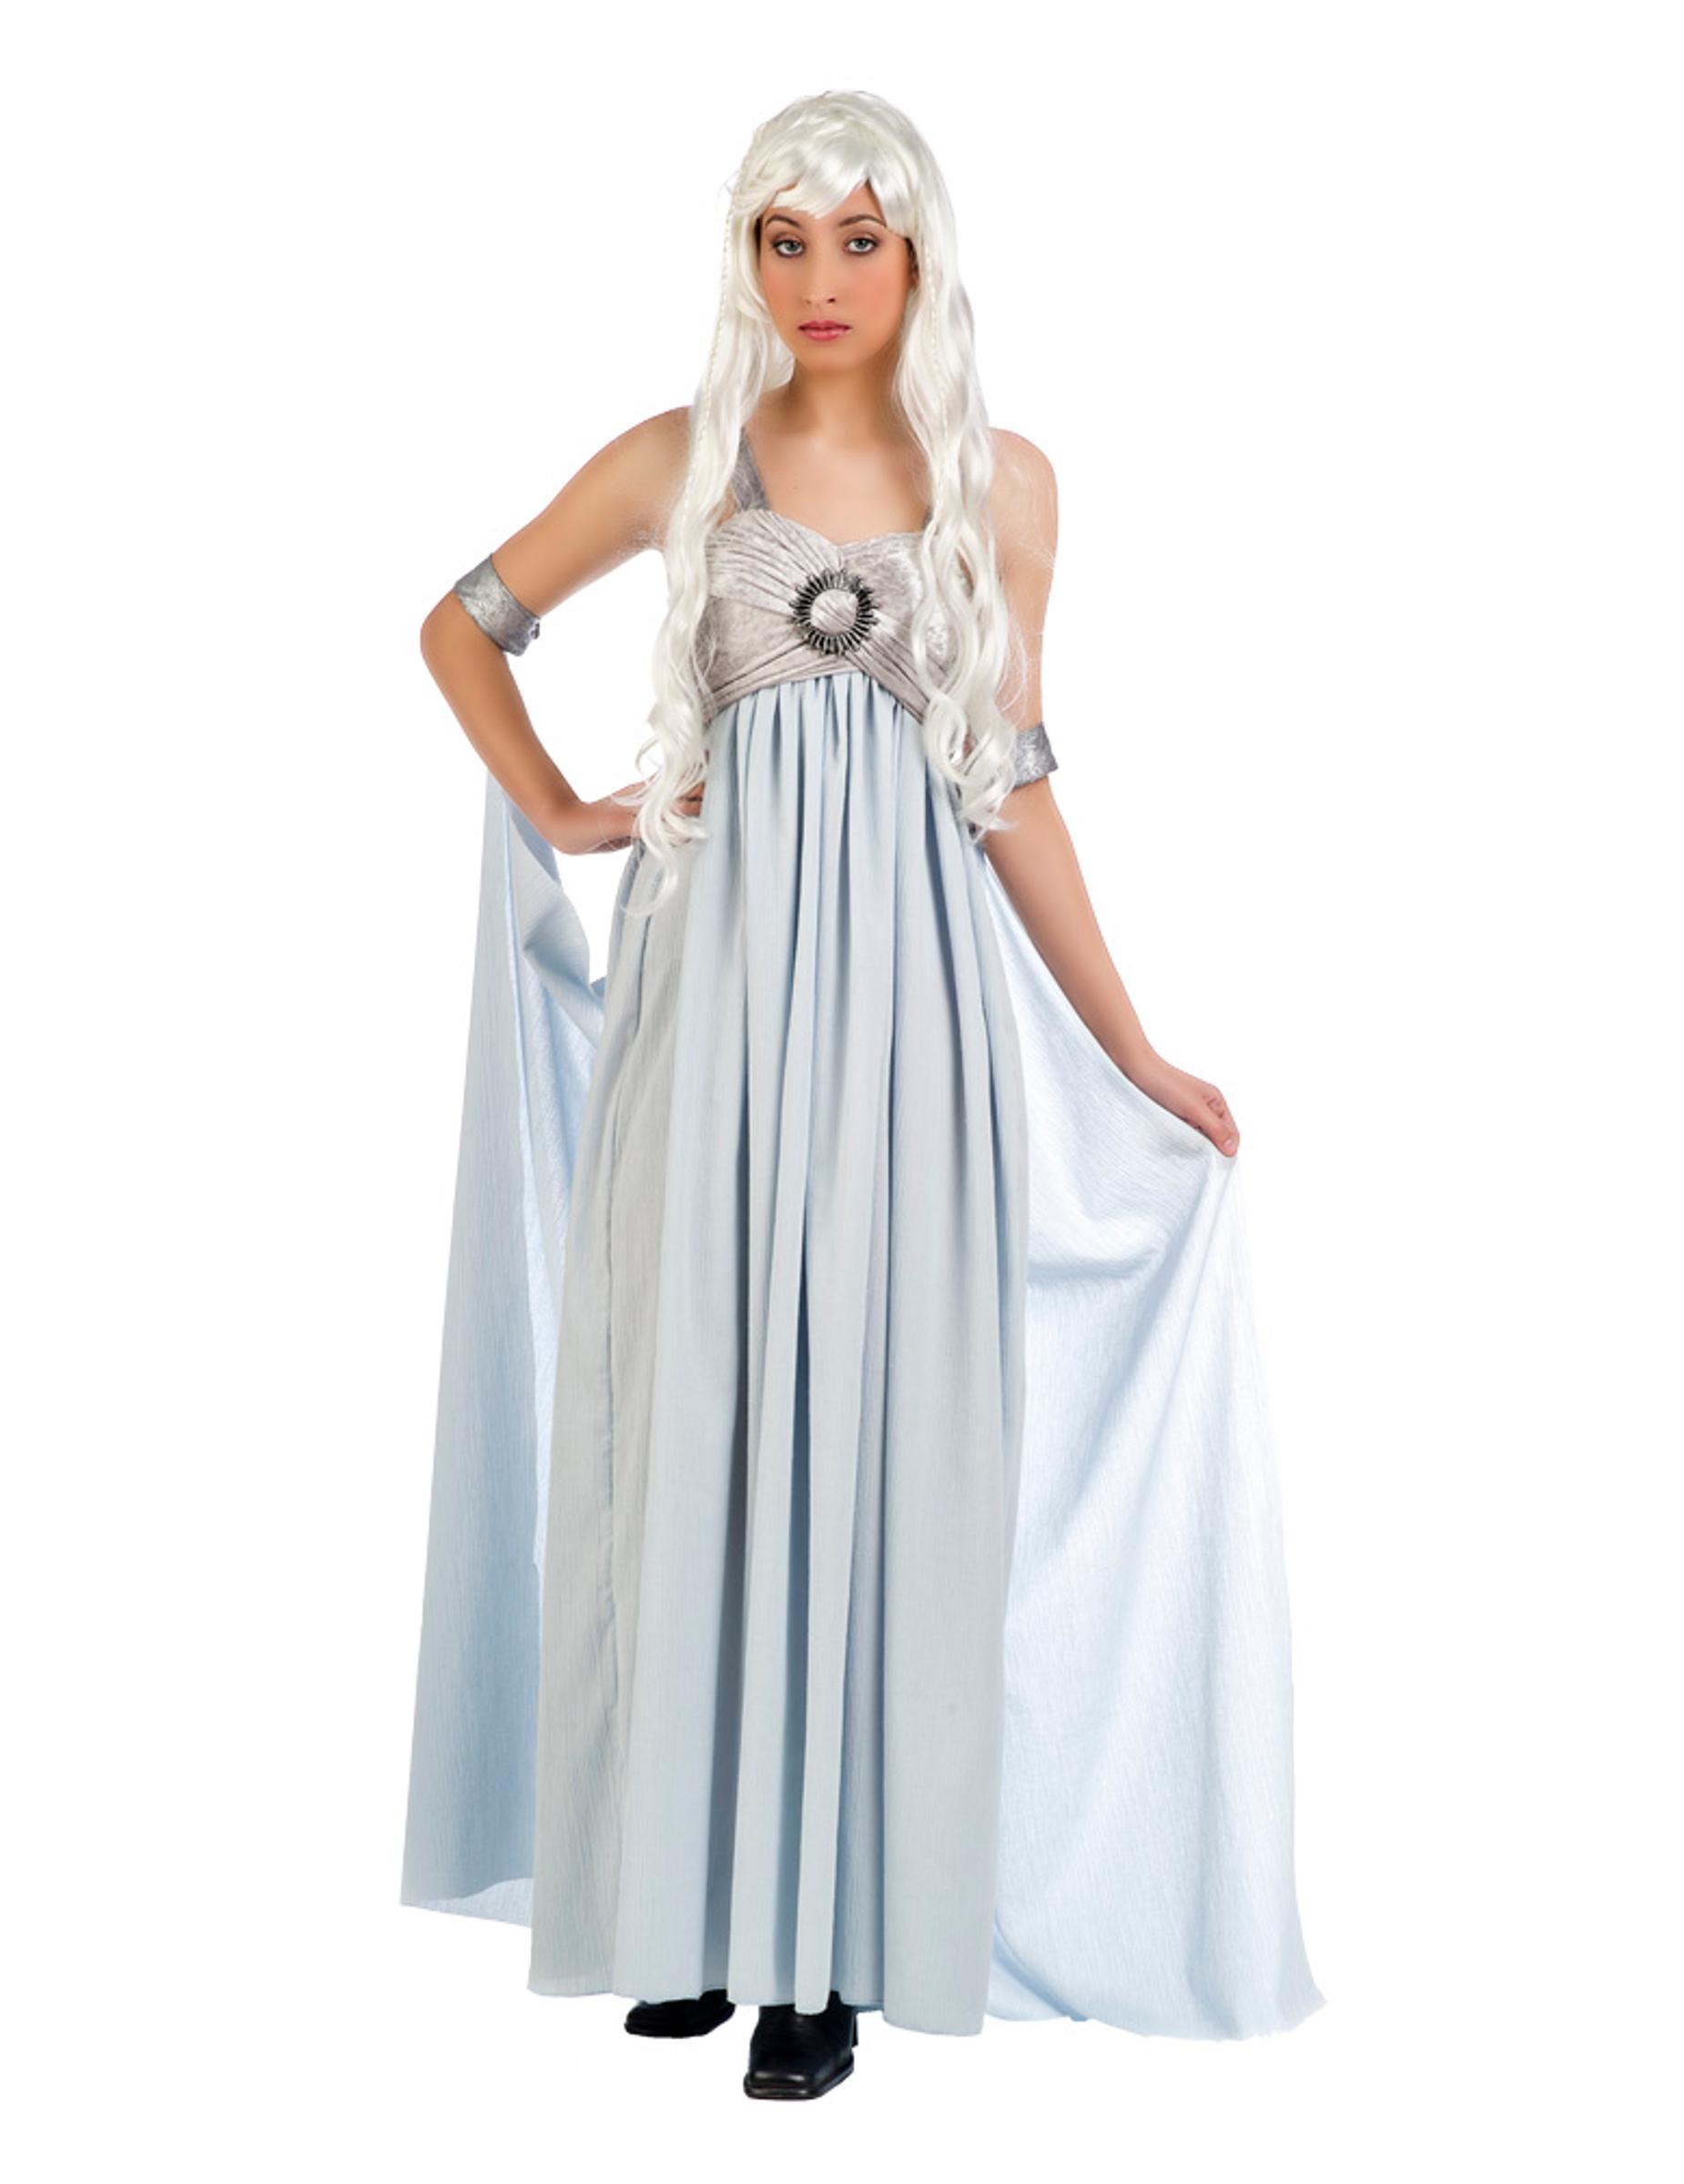 Prinzessin Kostum Fur Damen Blau Gunstige Faschings Kostume Bei